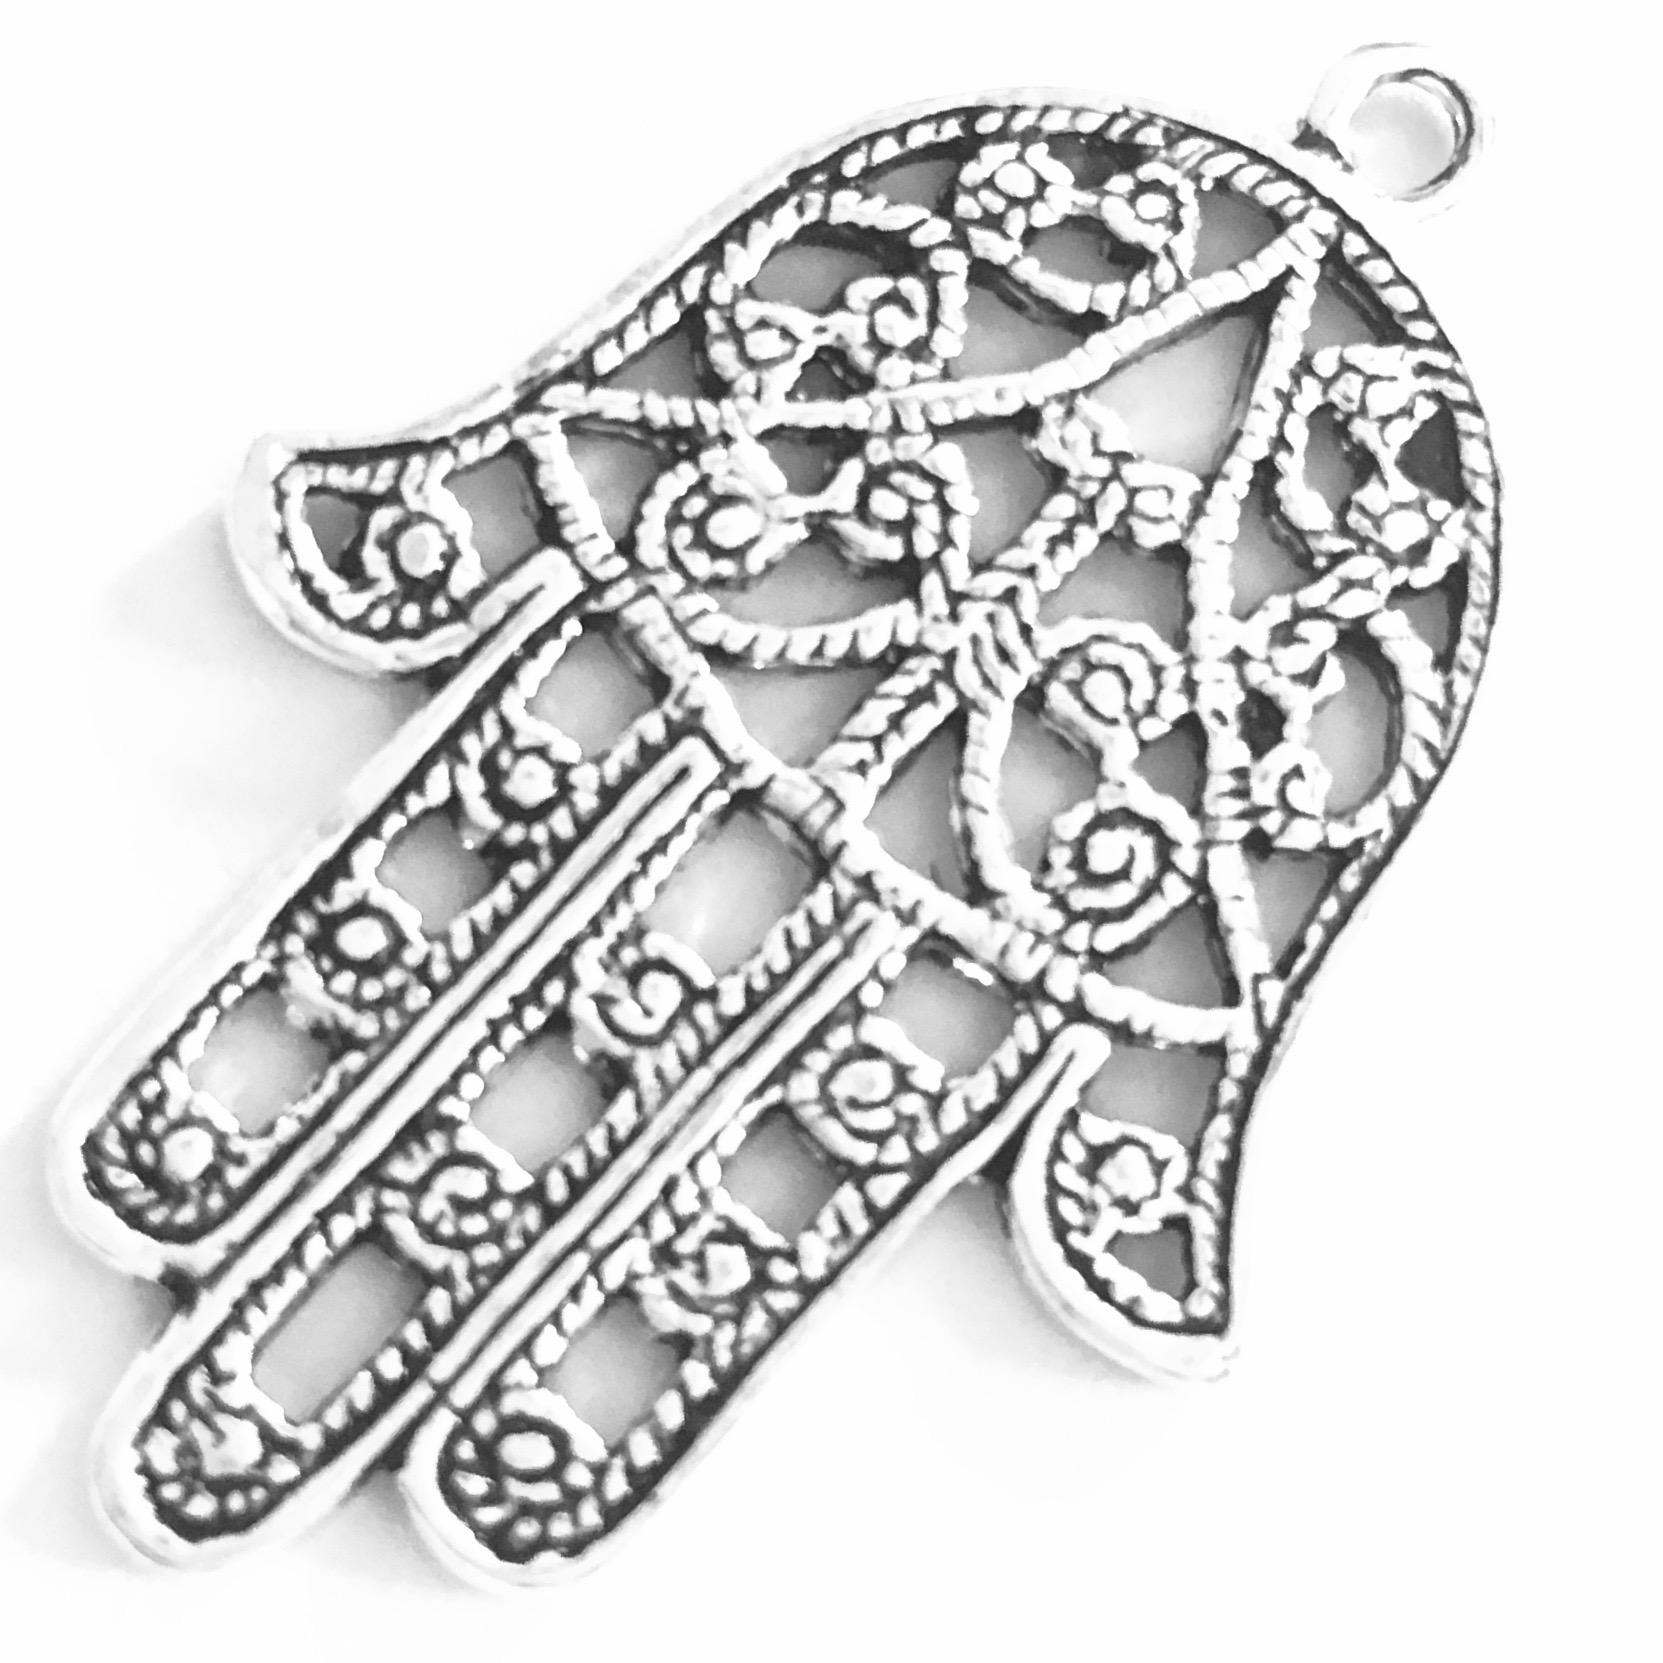 Sterling Silver Charm Pendant Hamsa 4 cm 6 gram